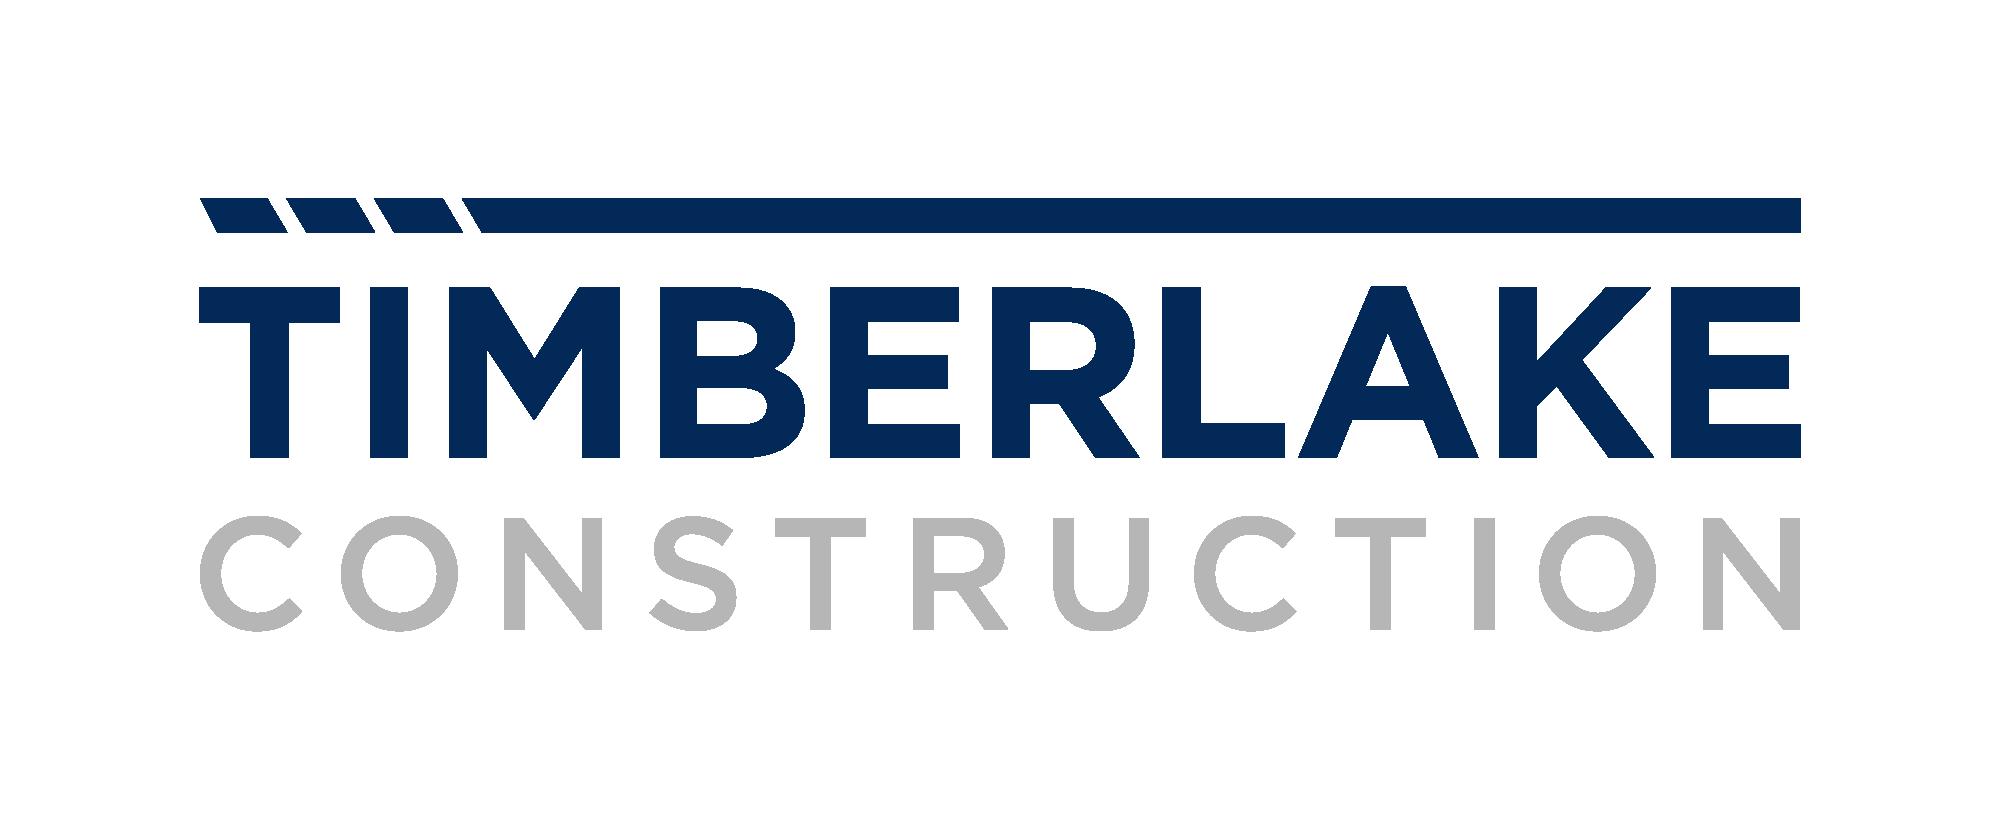 Timberlake Construction Logo